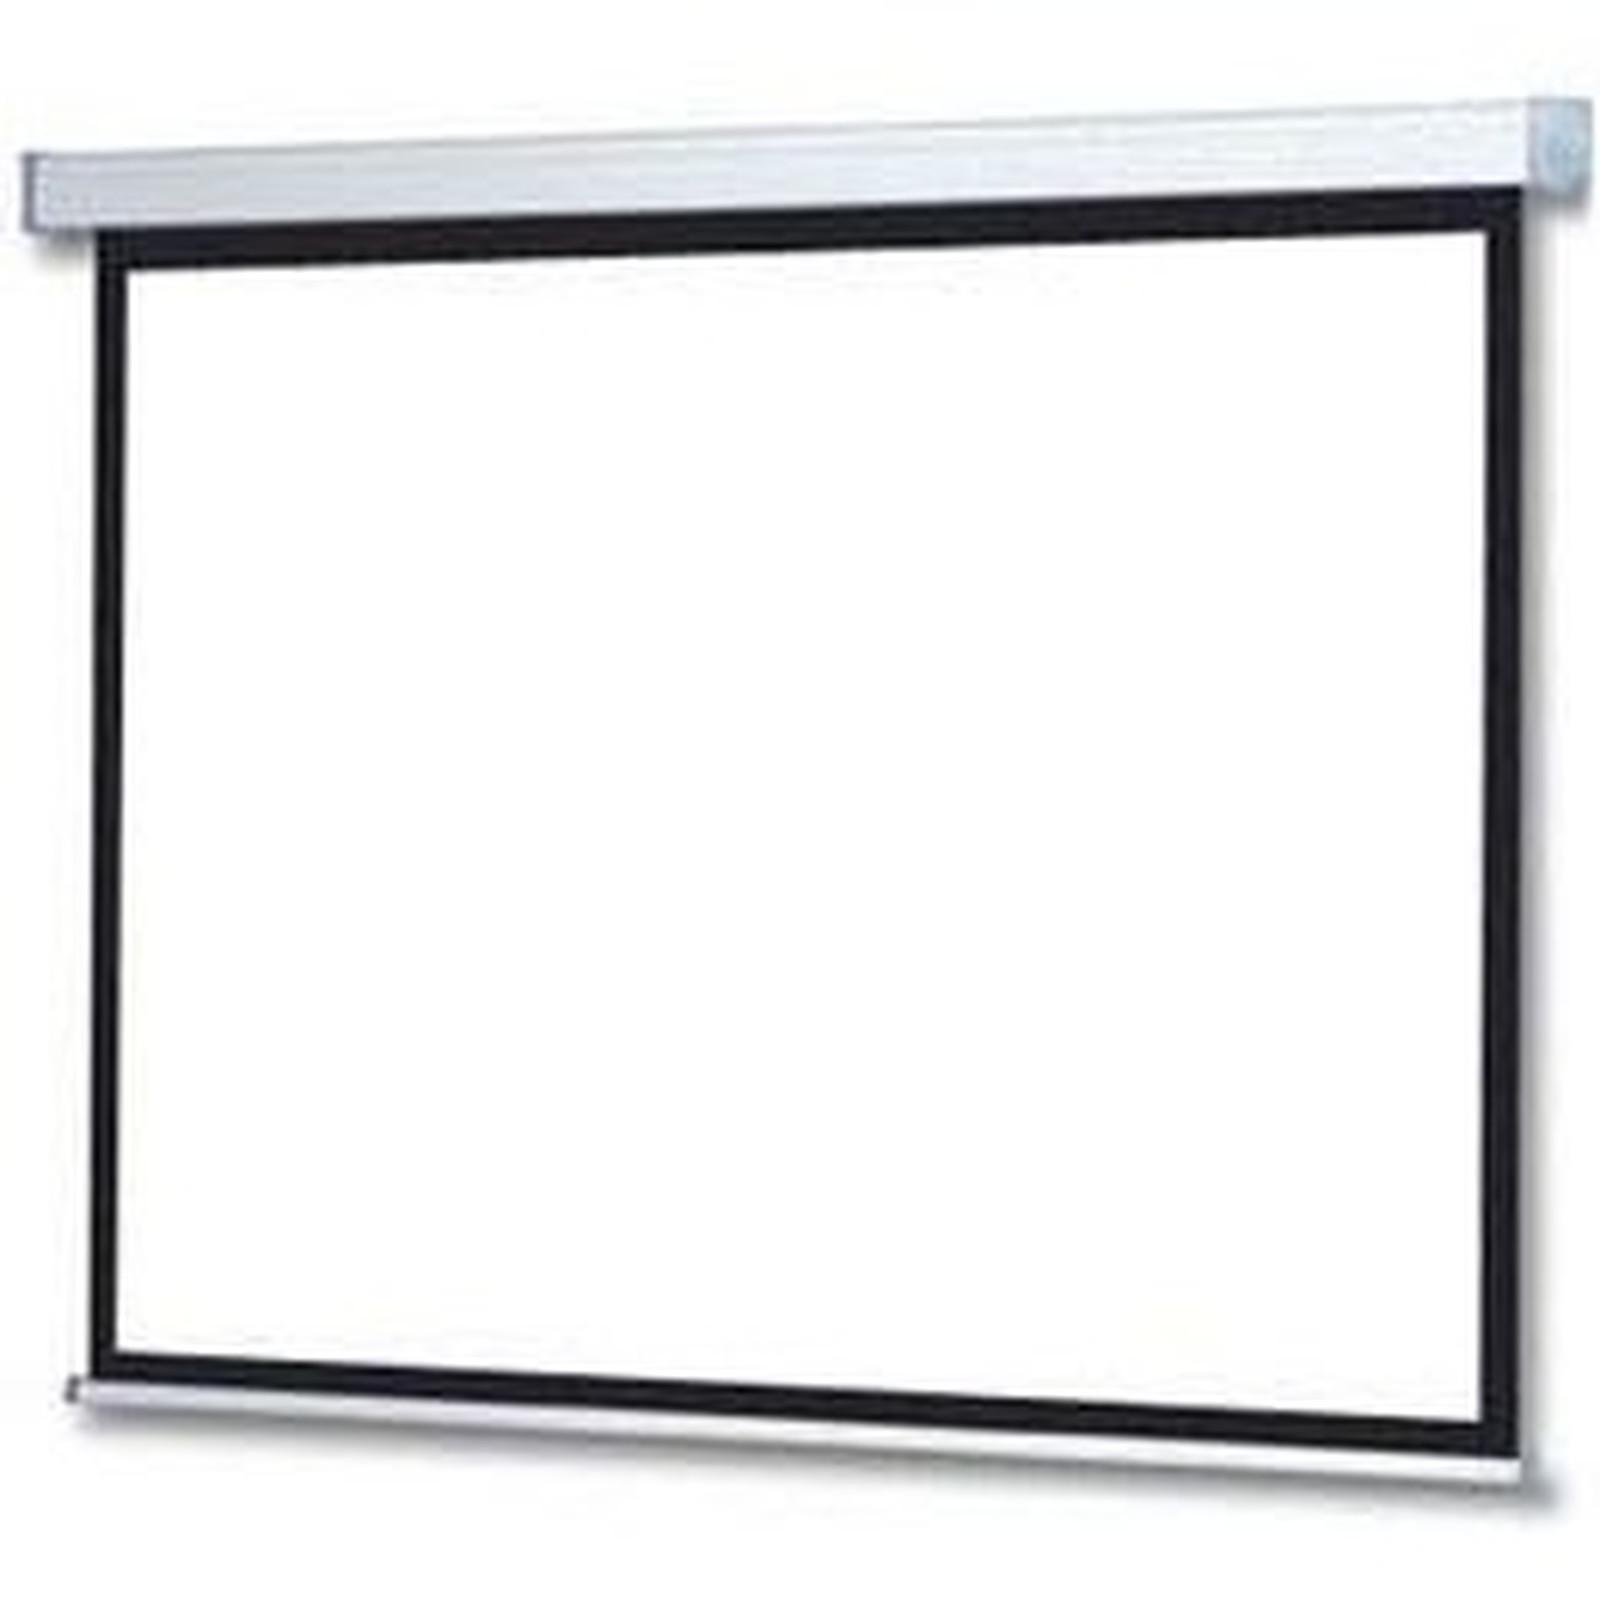 LDLC Ecran motorisé - Format 1:1 - 180 x 180 cm